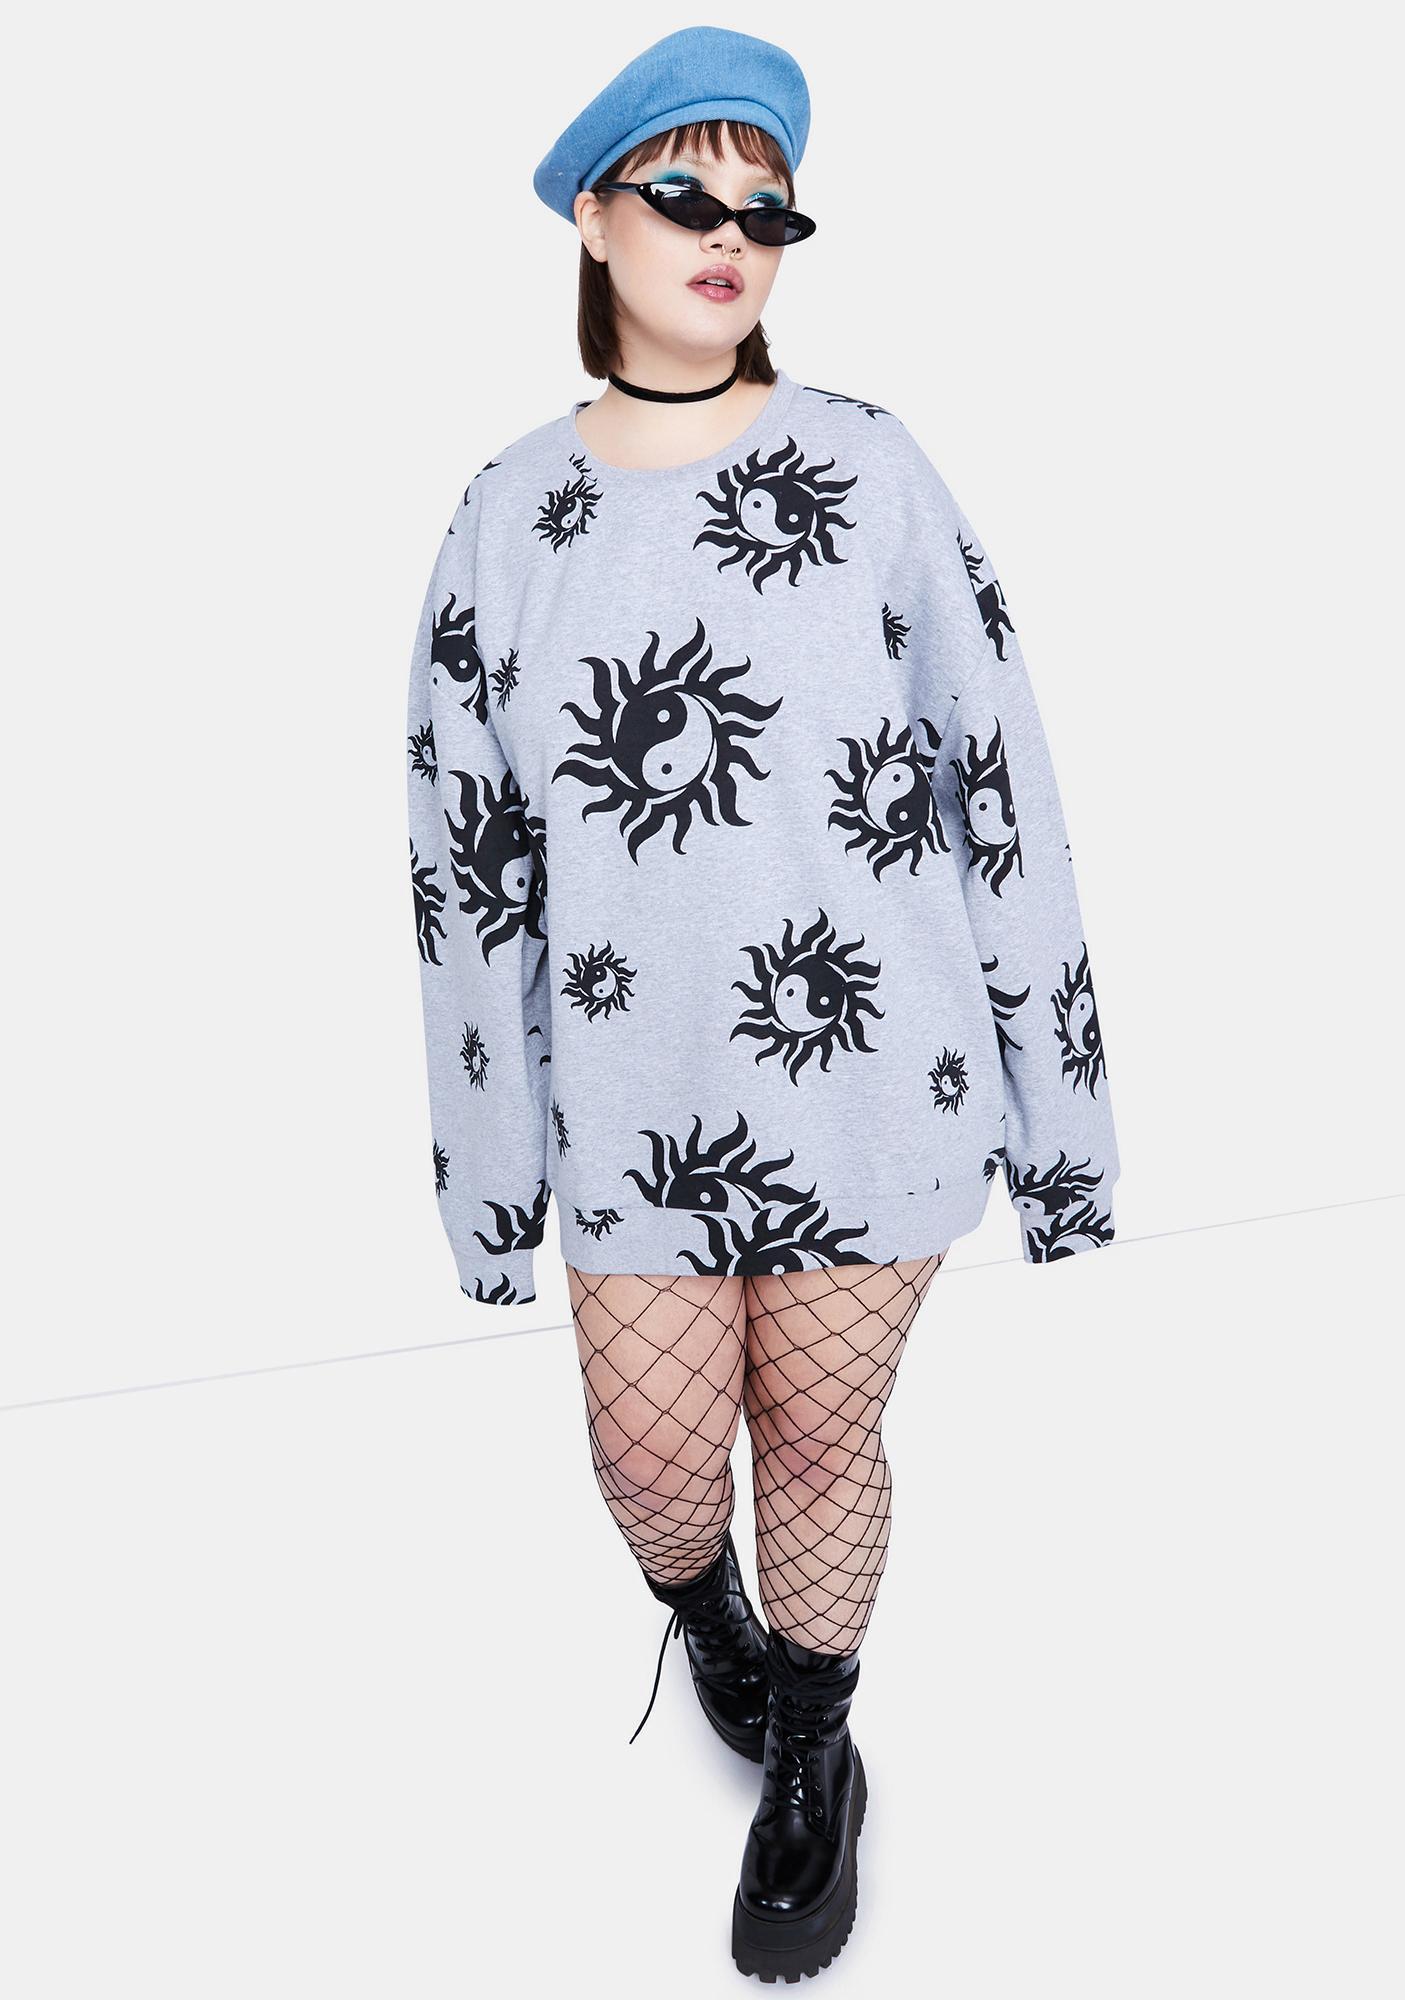 NEW GIRL ORDER Curve Yin Yang Marl Crewneck Sweatshirt